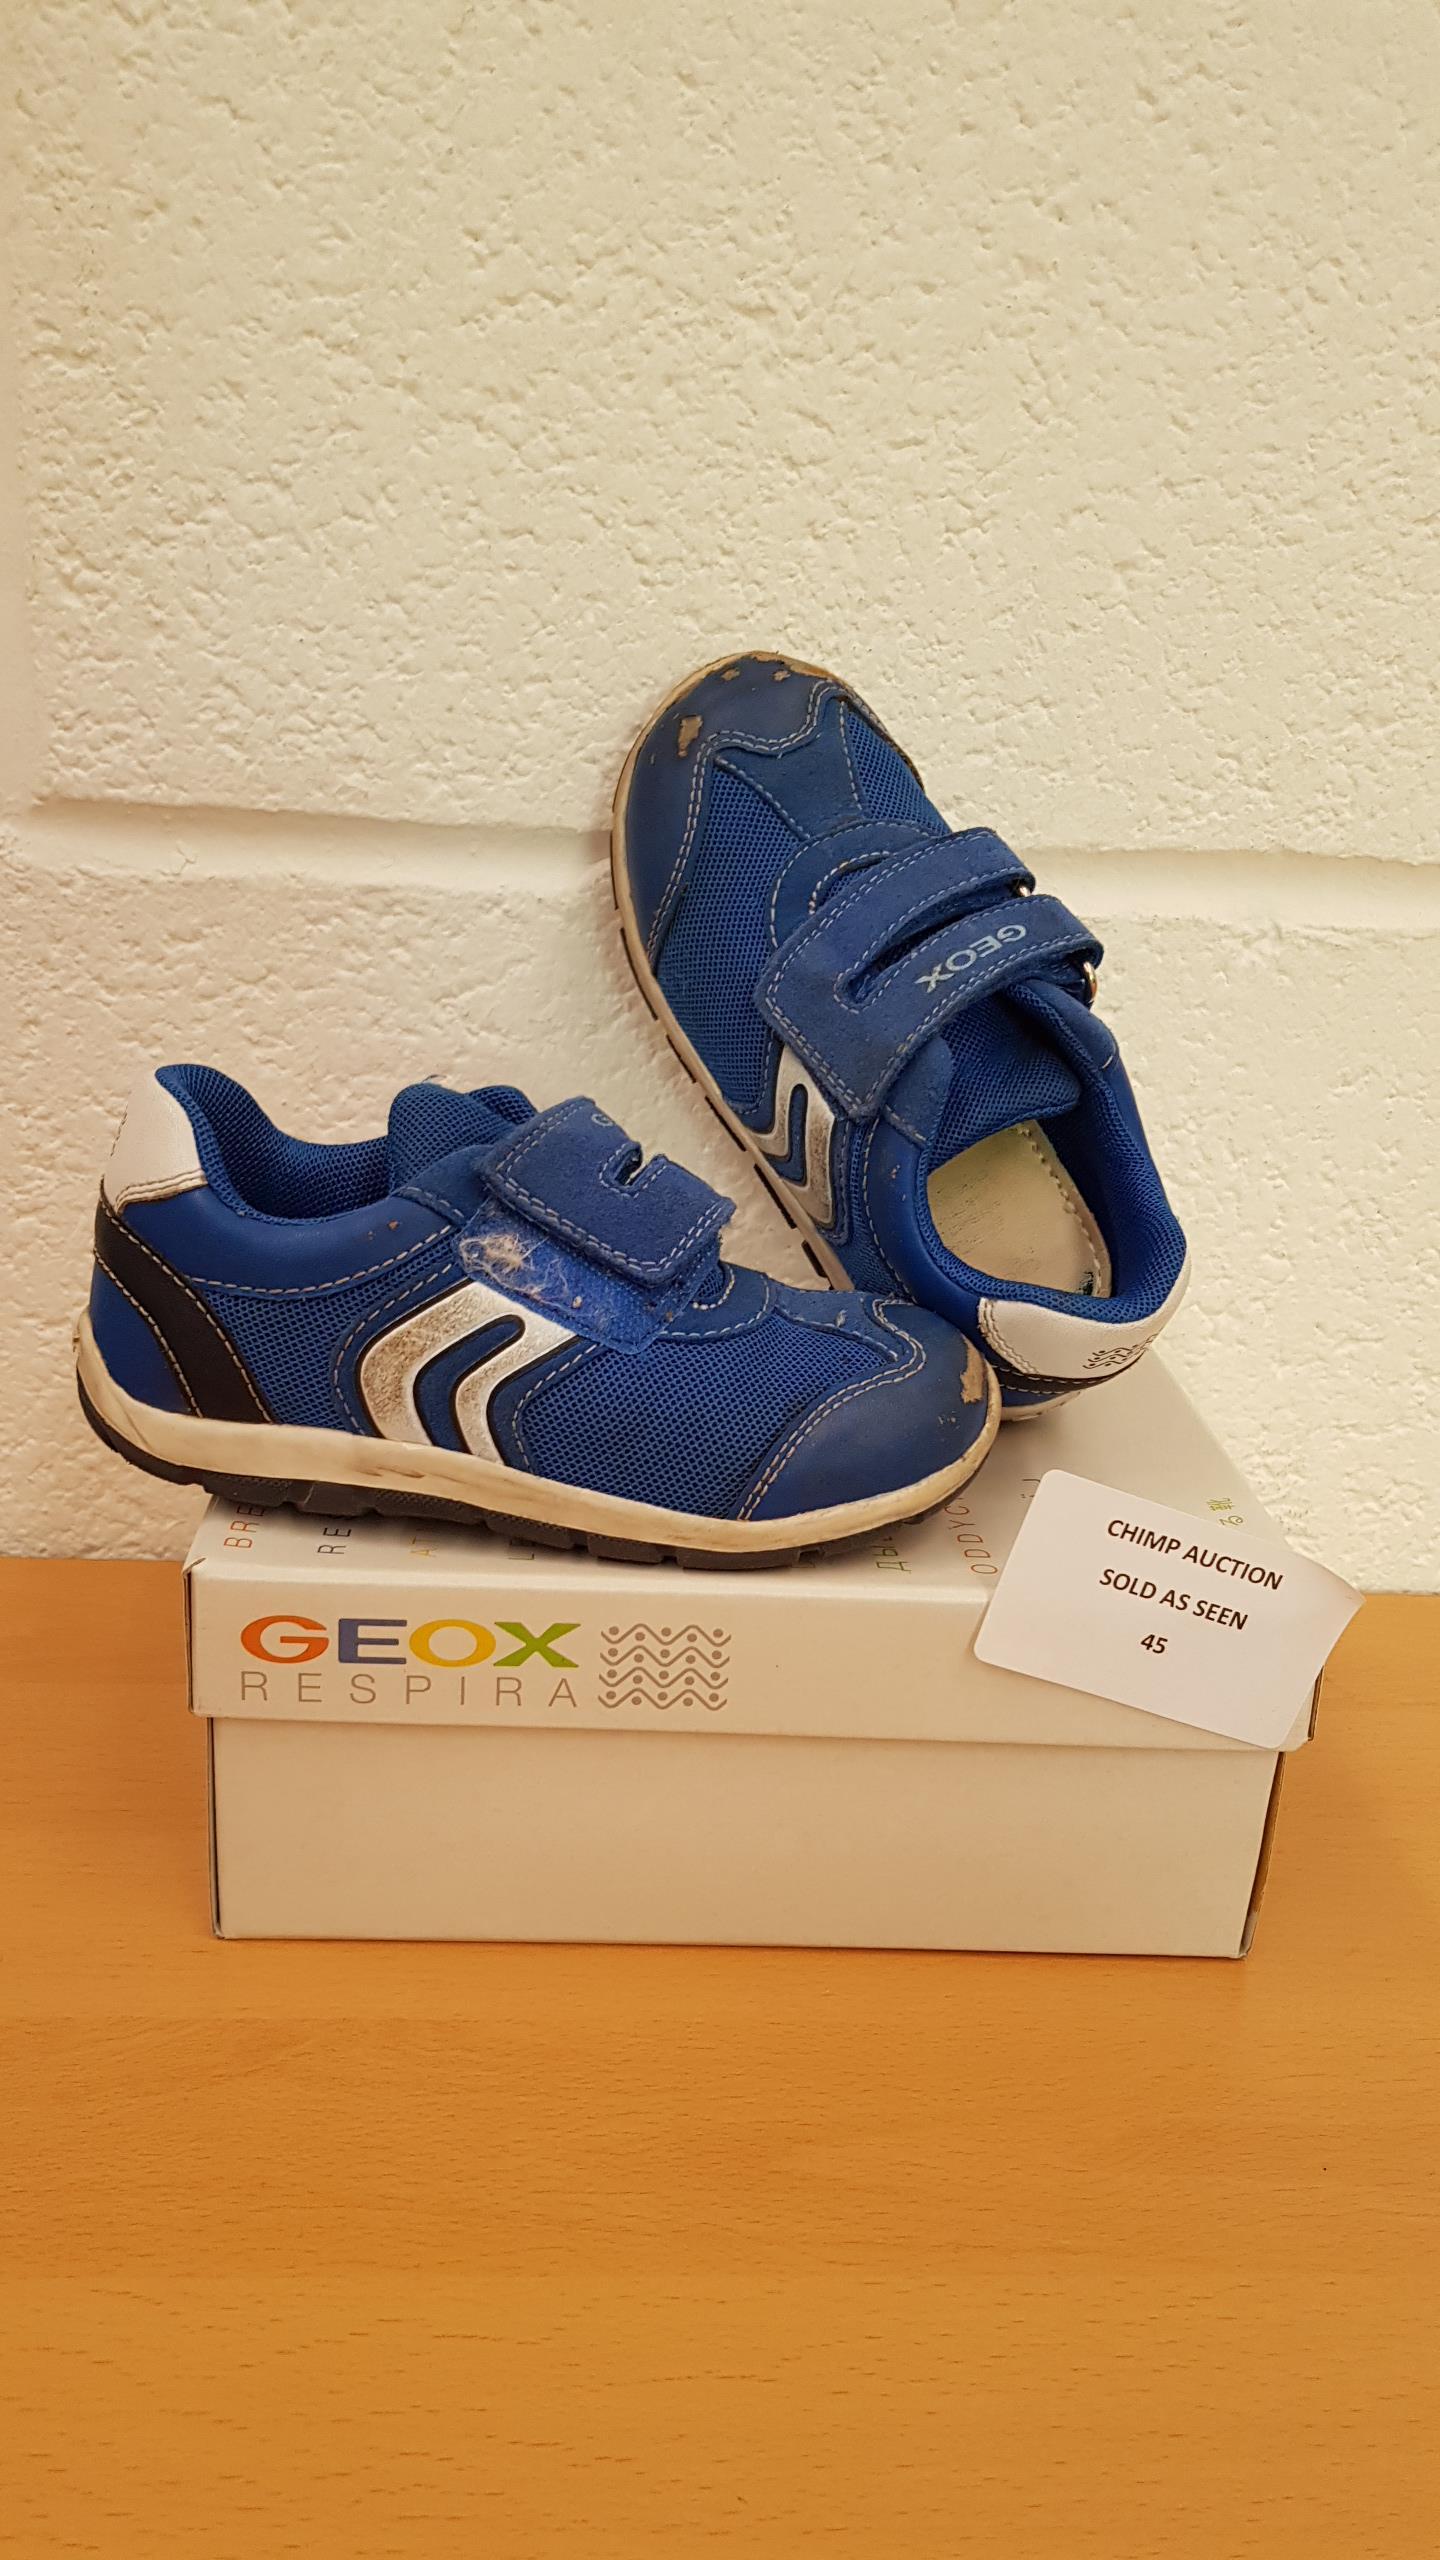 Lot 45 - Geox Respira kids shoes uk size 8.5